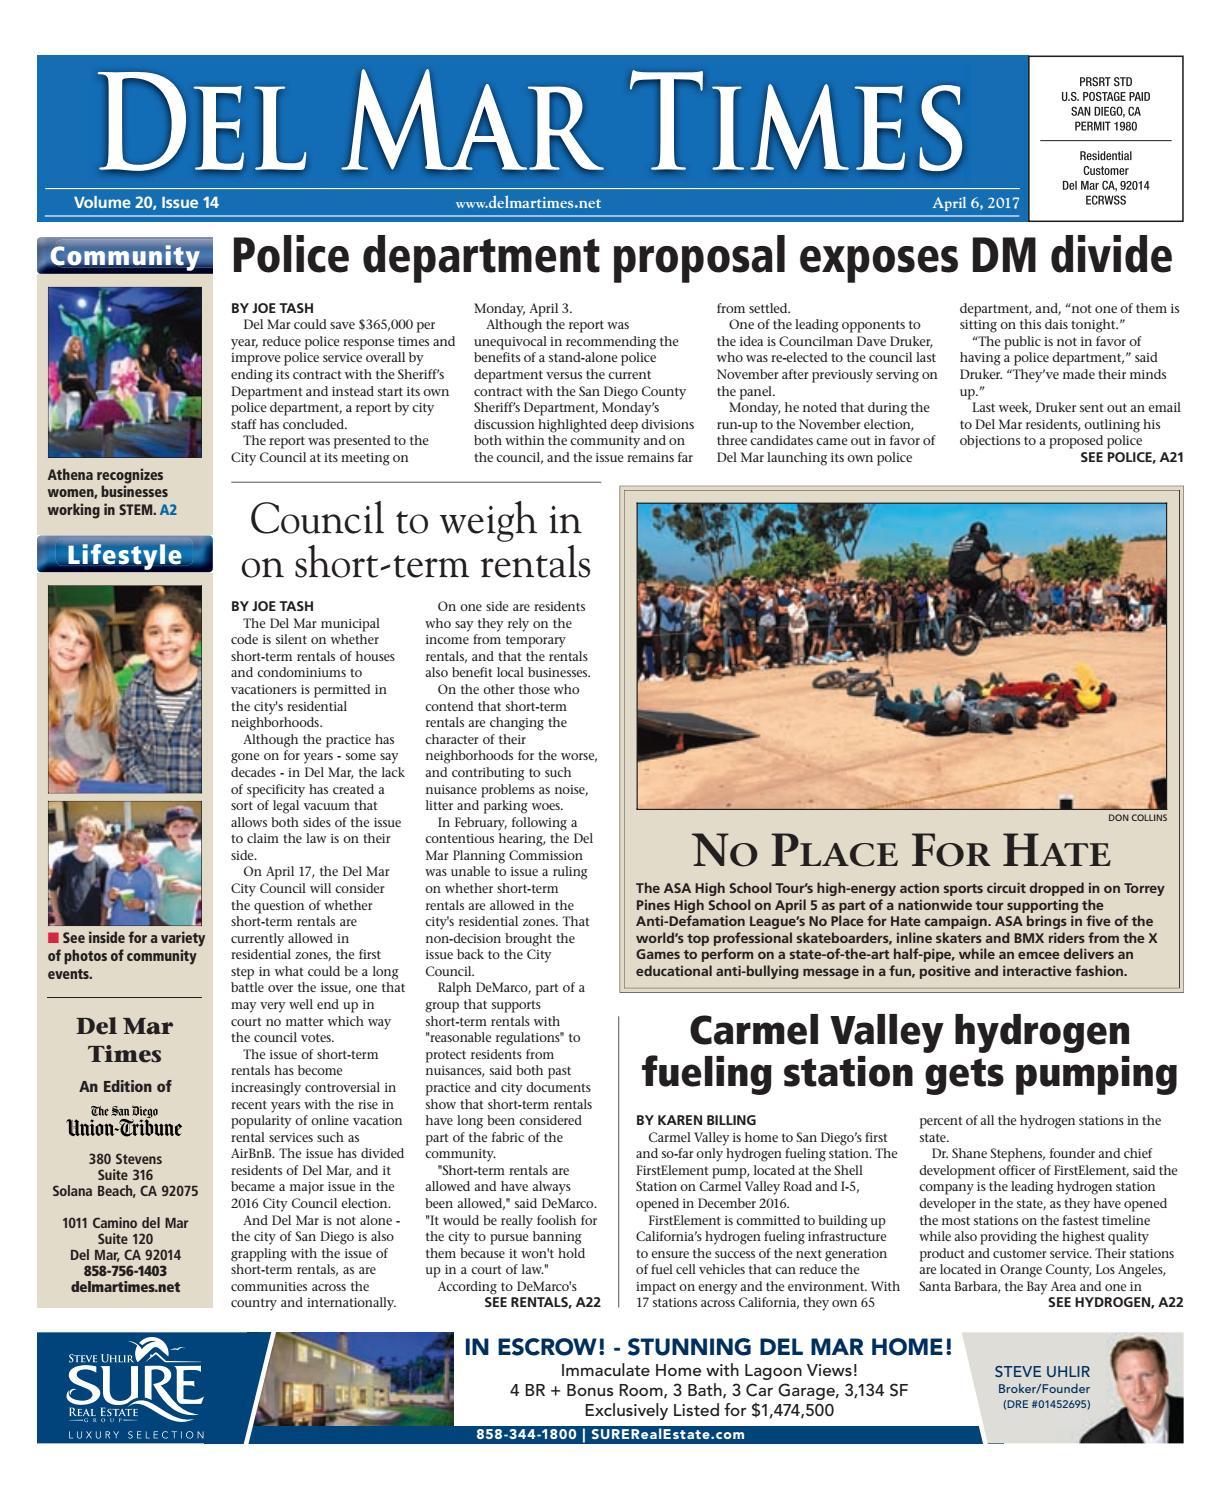 Del mar times 04 06 17 by MainStreet Media - issuu